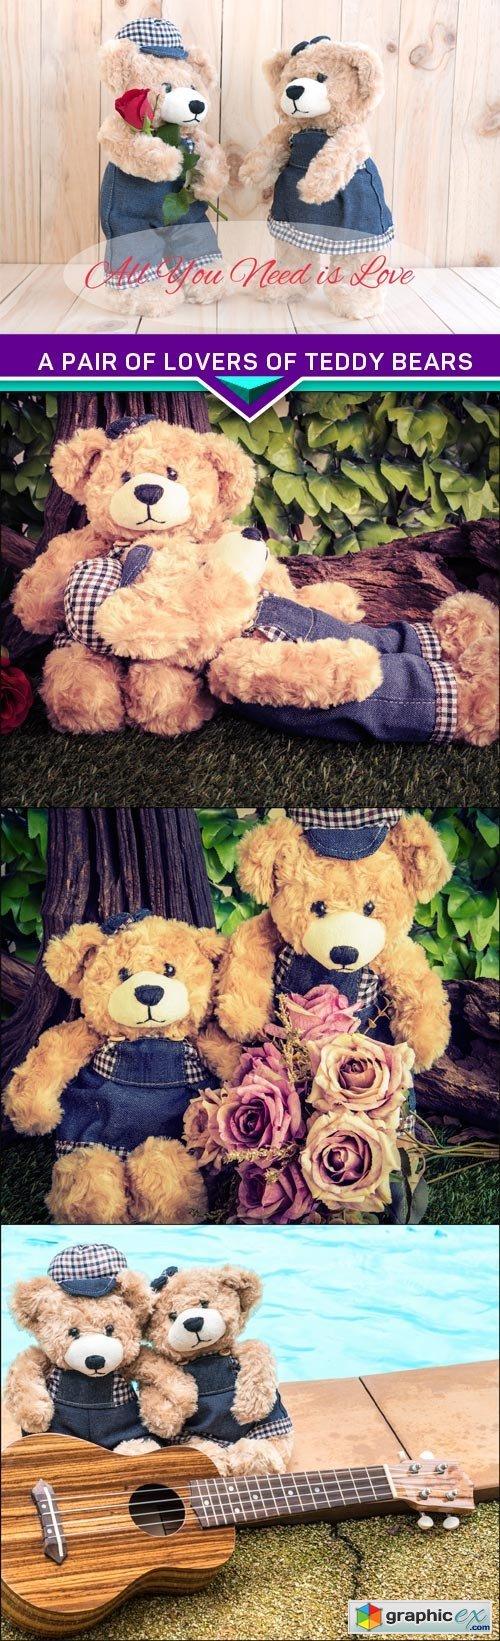 A pair of lovers of teddy bears 4X JPEG